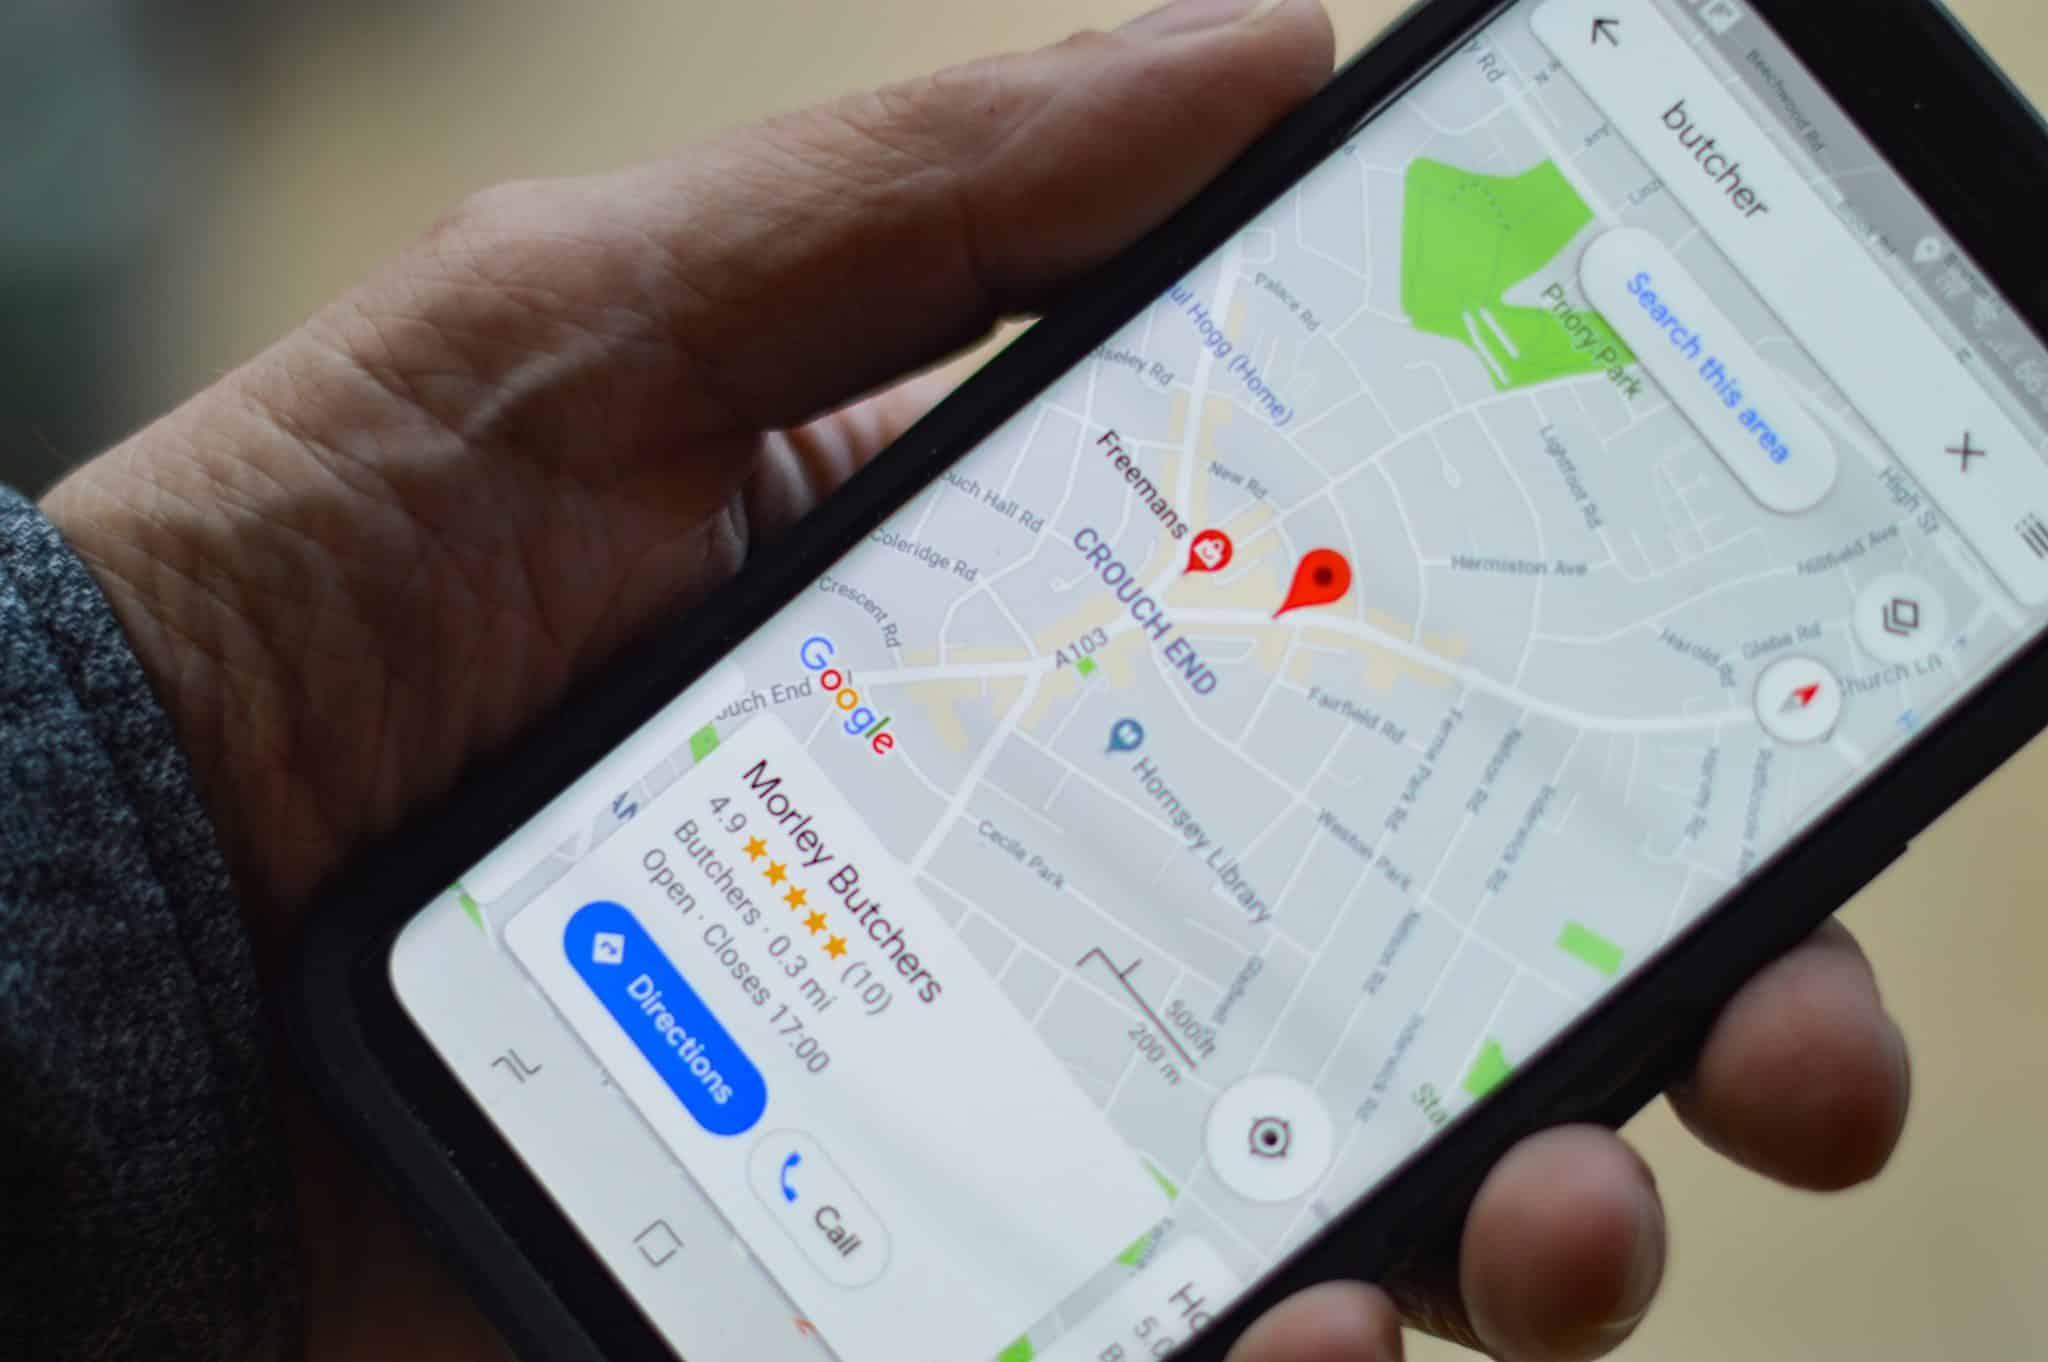 Google maps on a smartphone